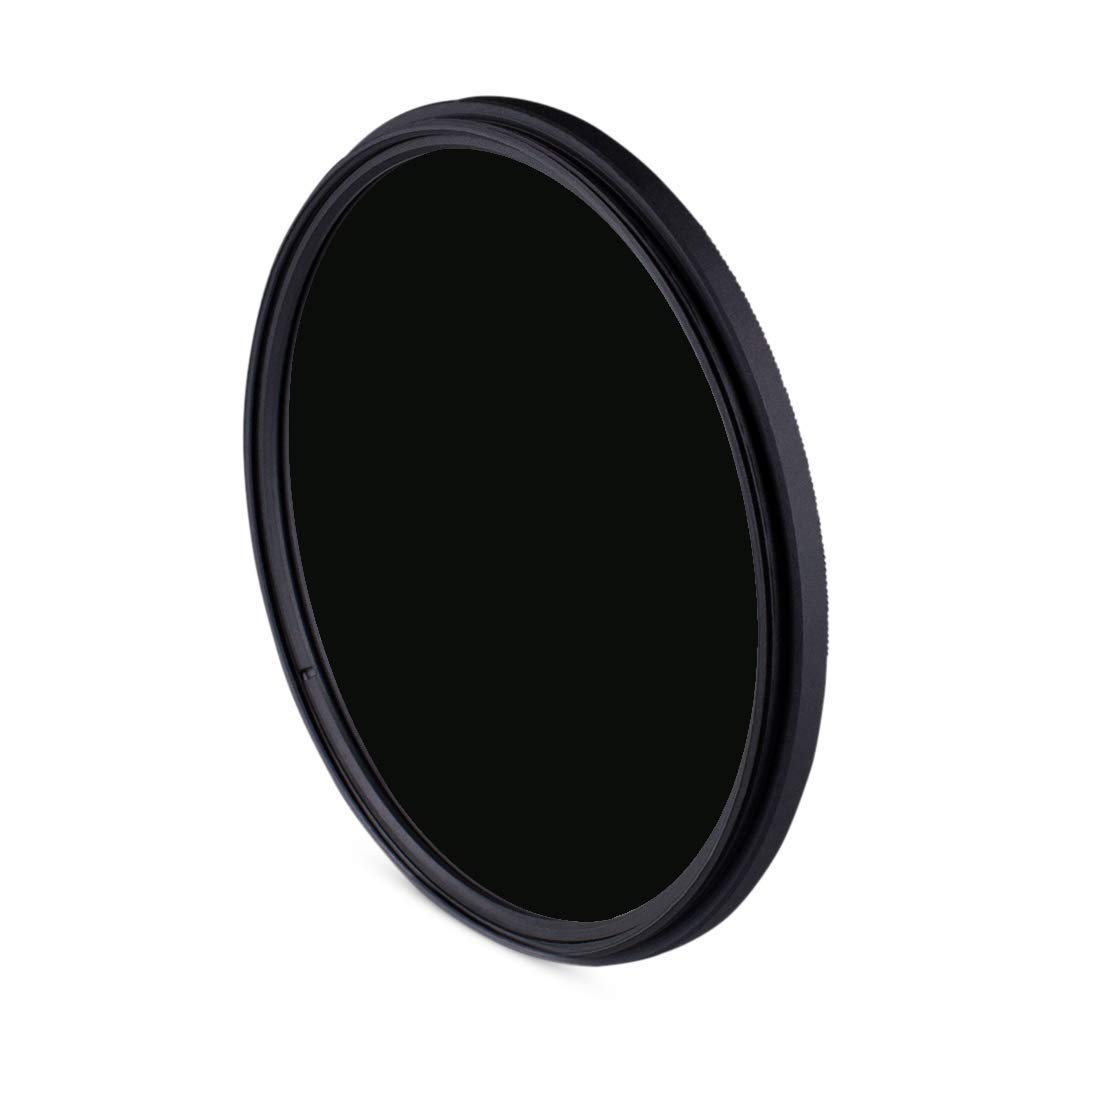 Gobe Filtro ND1000 72mm MRC a 16 Strati ND